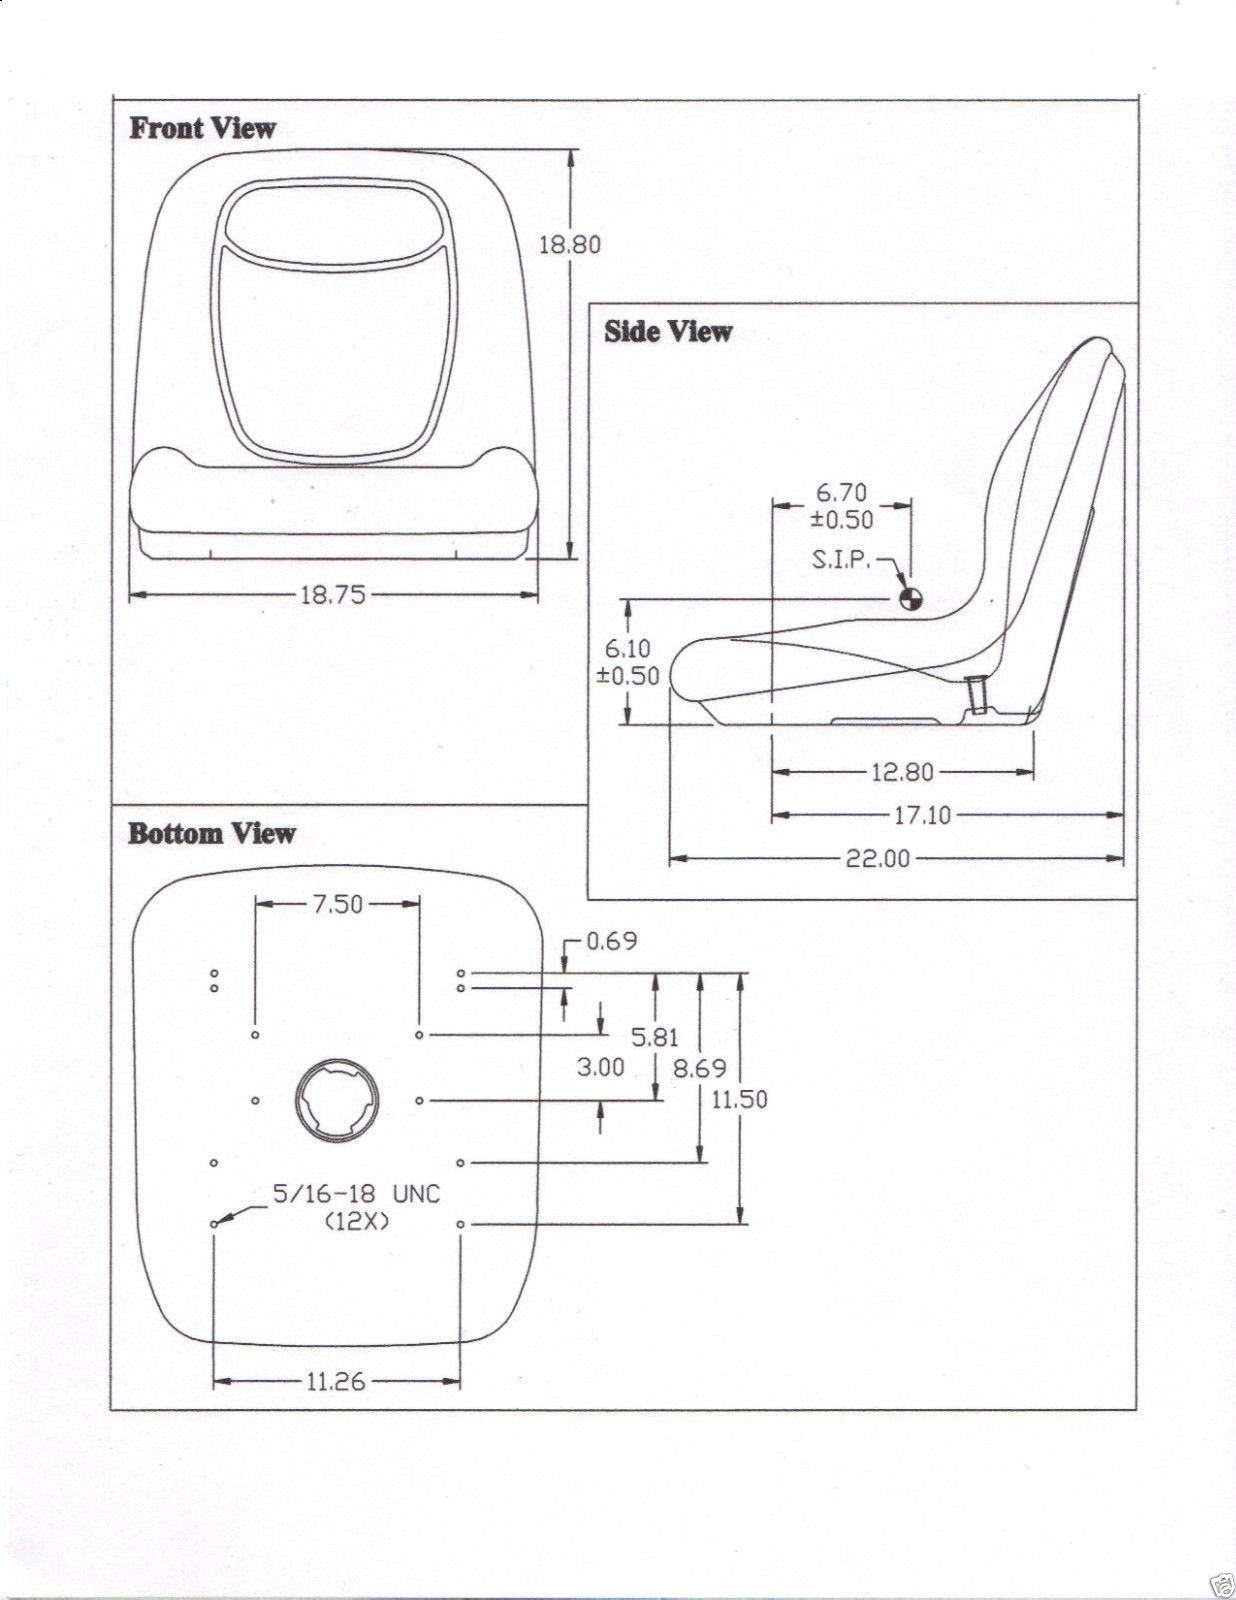 Encore Ztr Wiring Diagram | Wiring Liry on